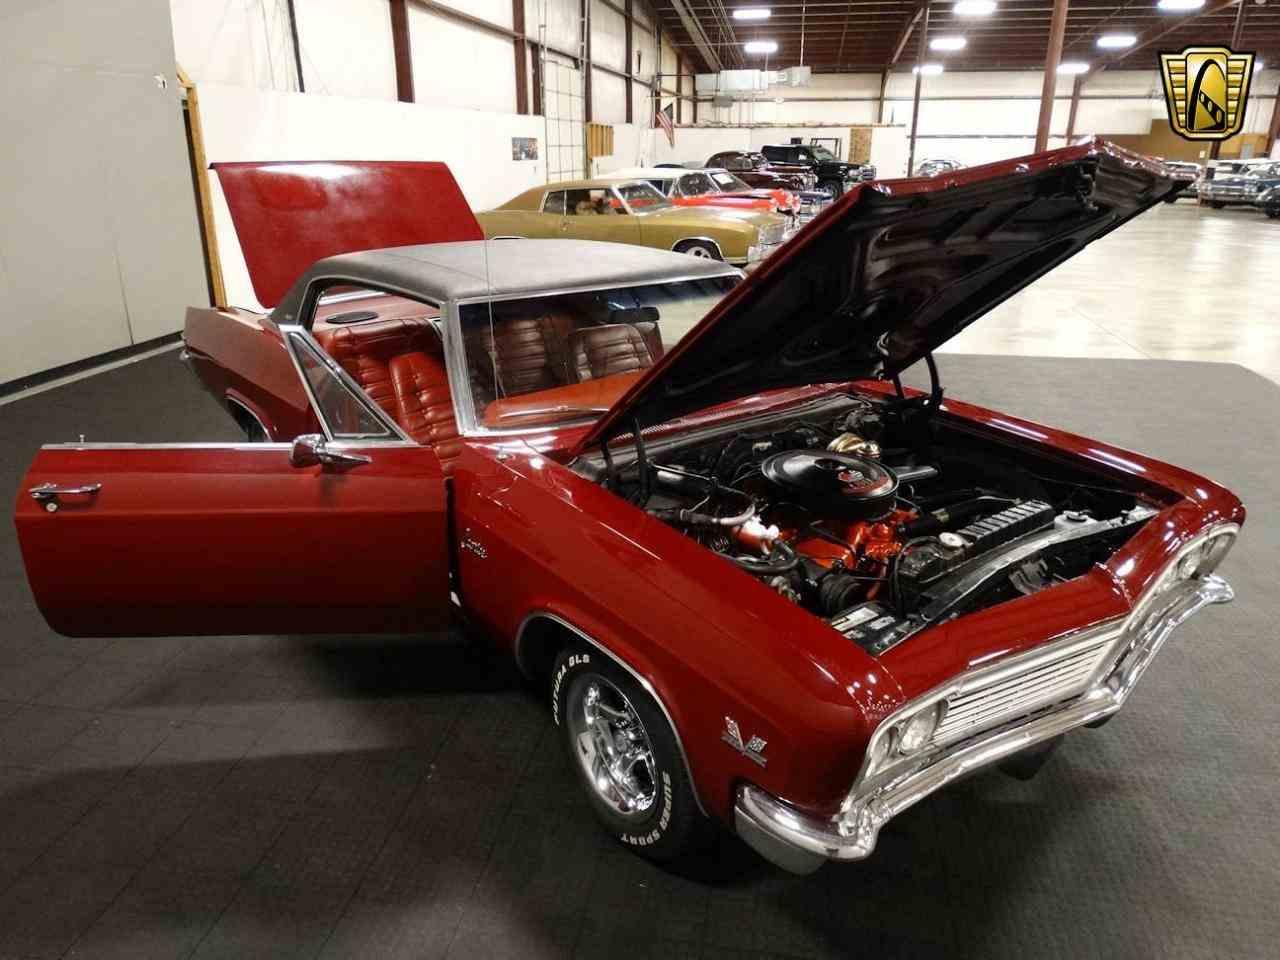 1966 Chevrolet Caprice for Sale | ClassicCars.com | CC-1035856